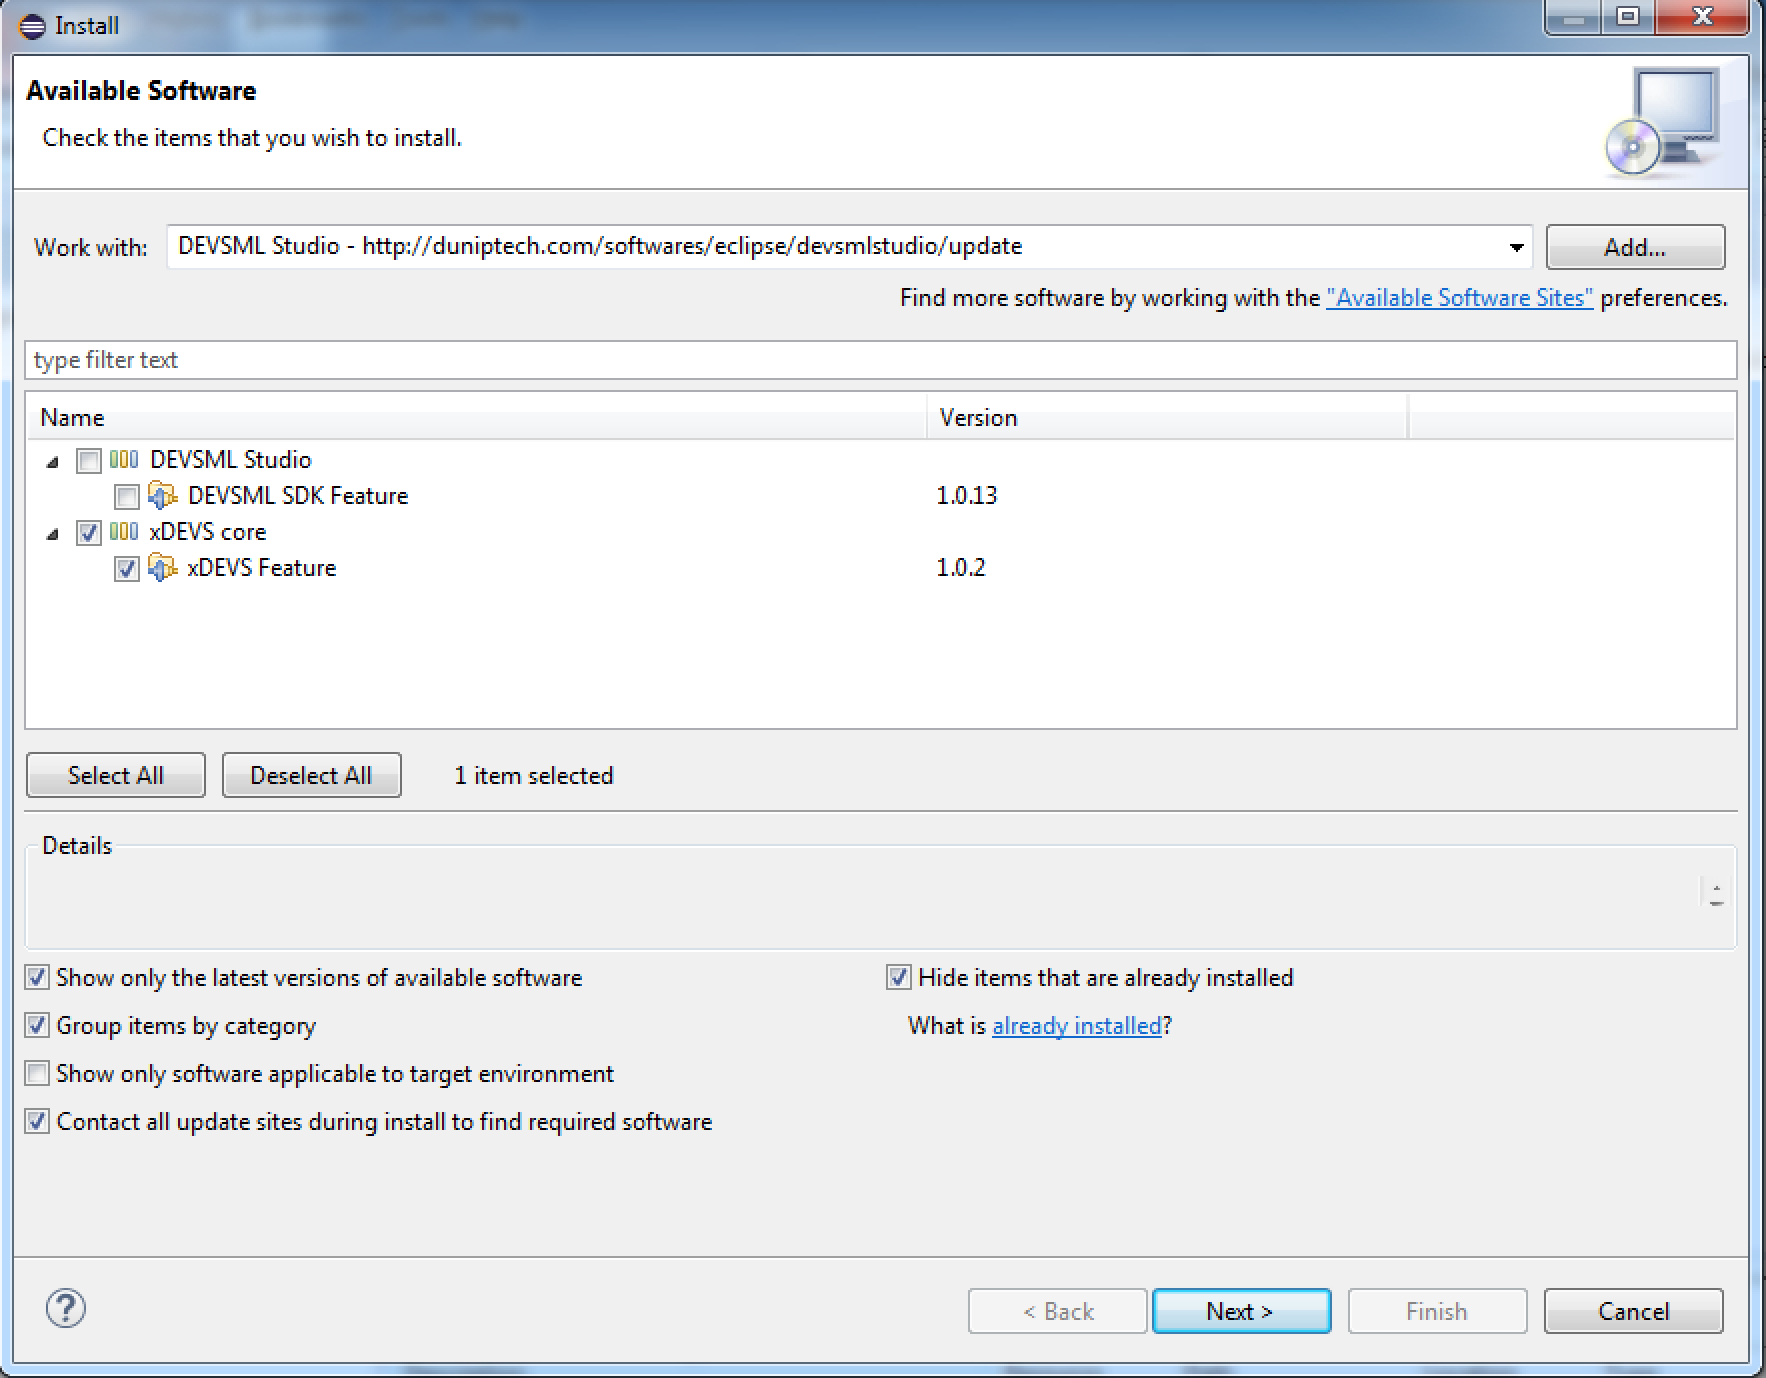 selenium webdriver tutorial pdf free download